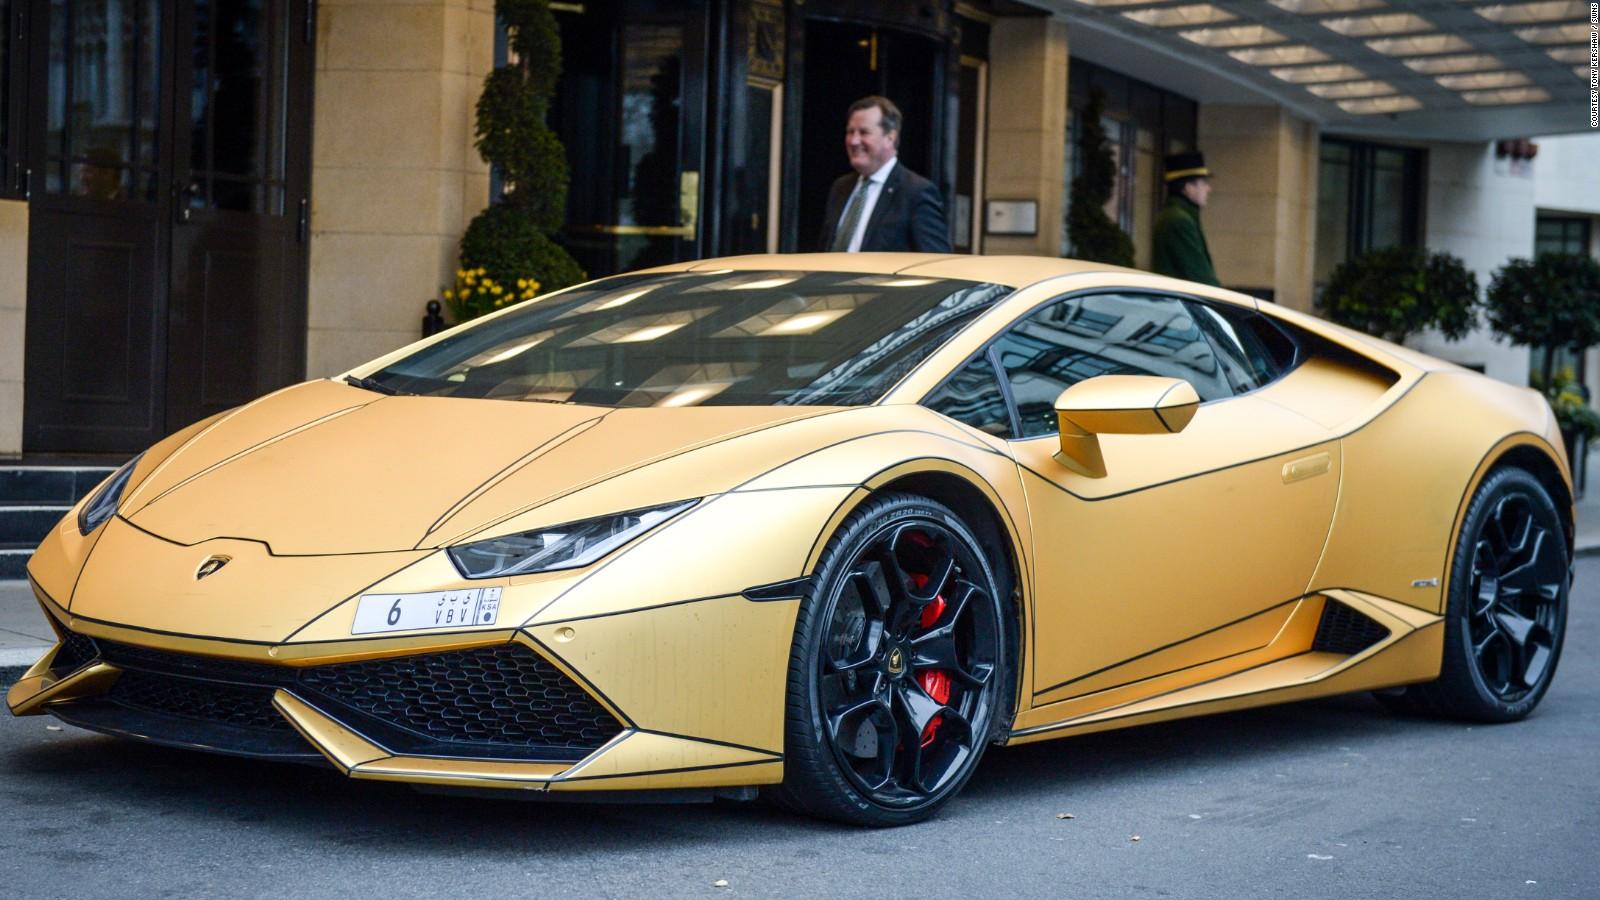 Super Rich Saudi S Gold Cars Hit London Cnn Style